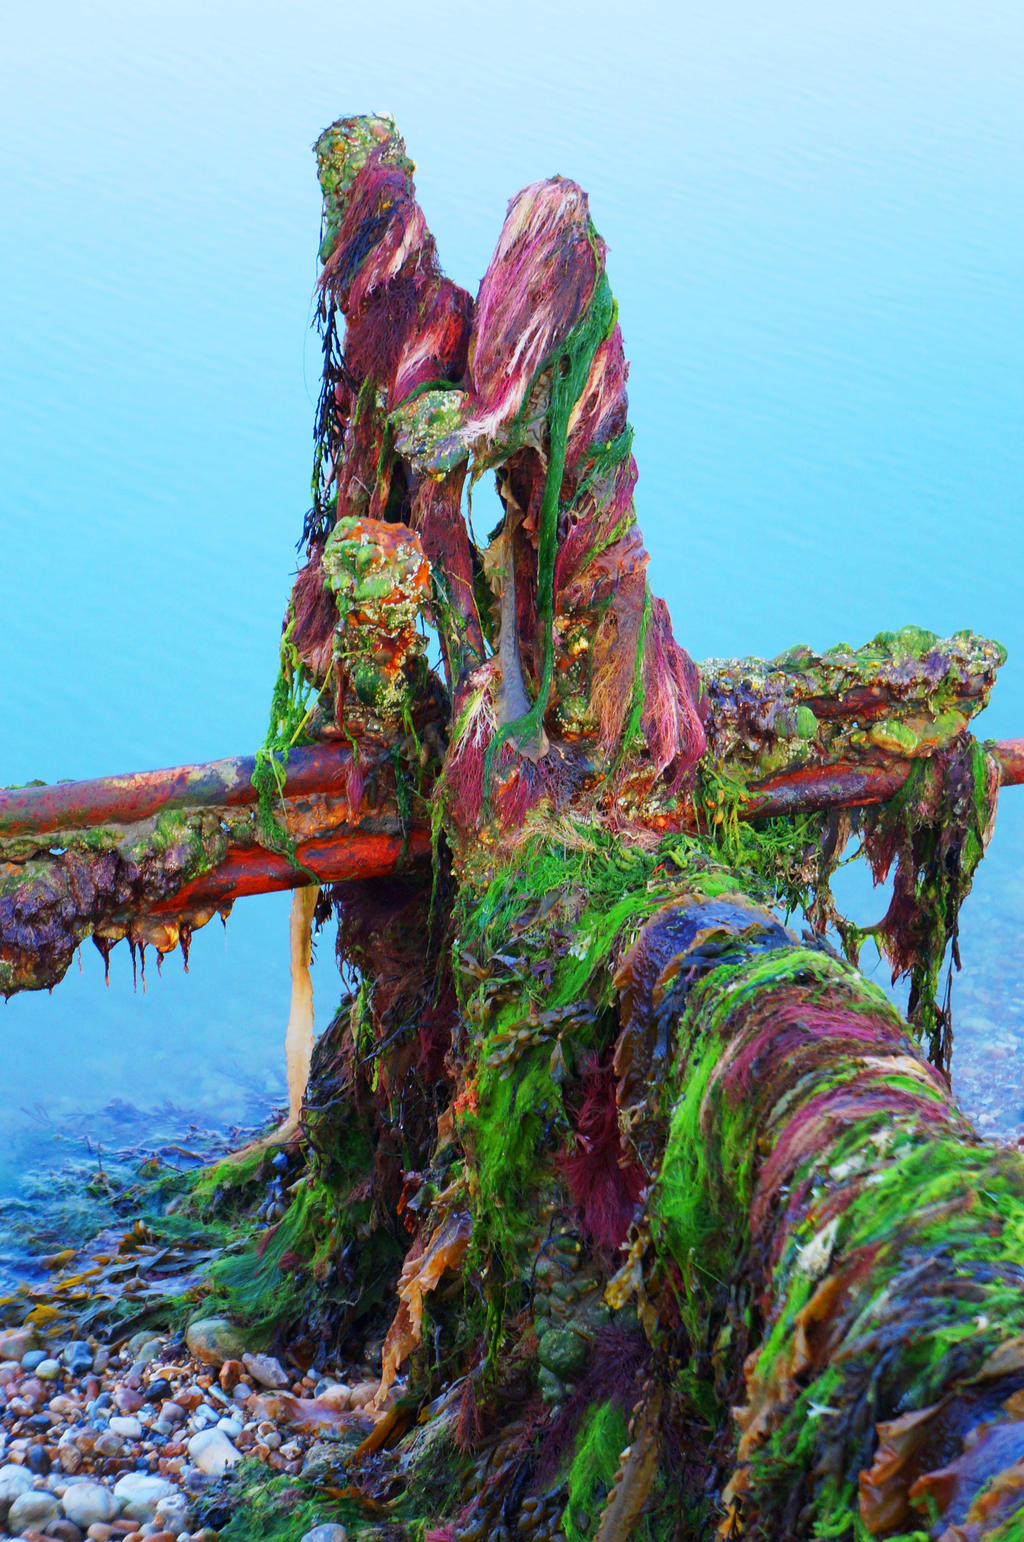 Seaweed by hayleyonfire